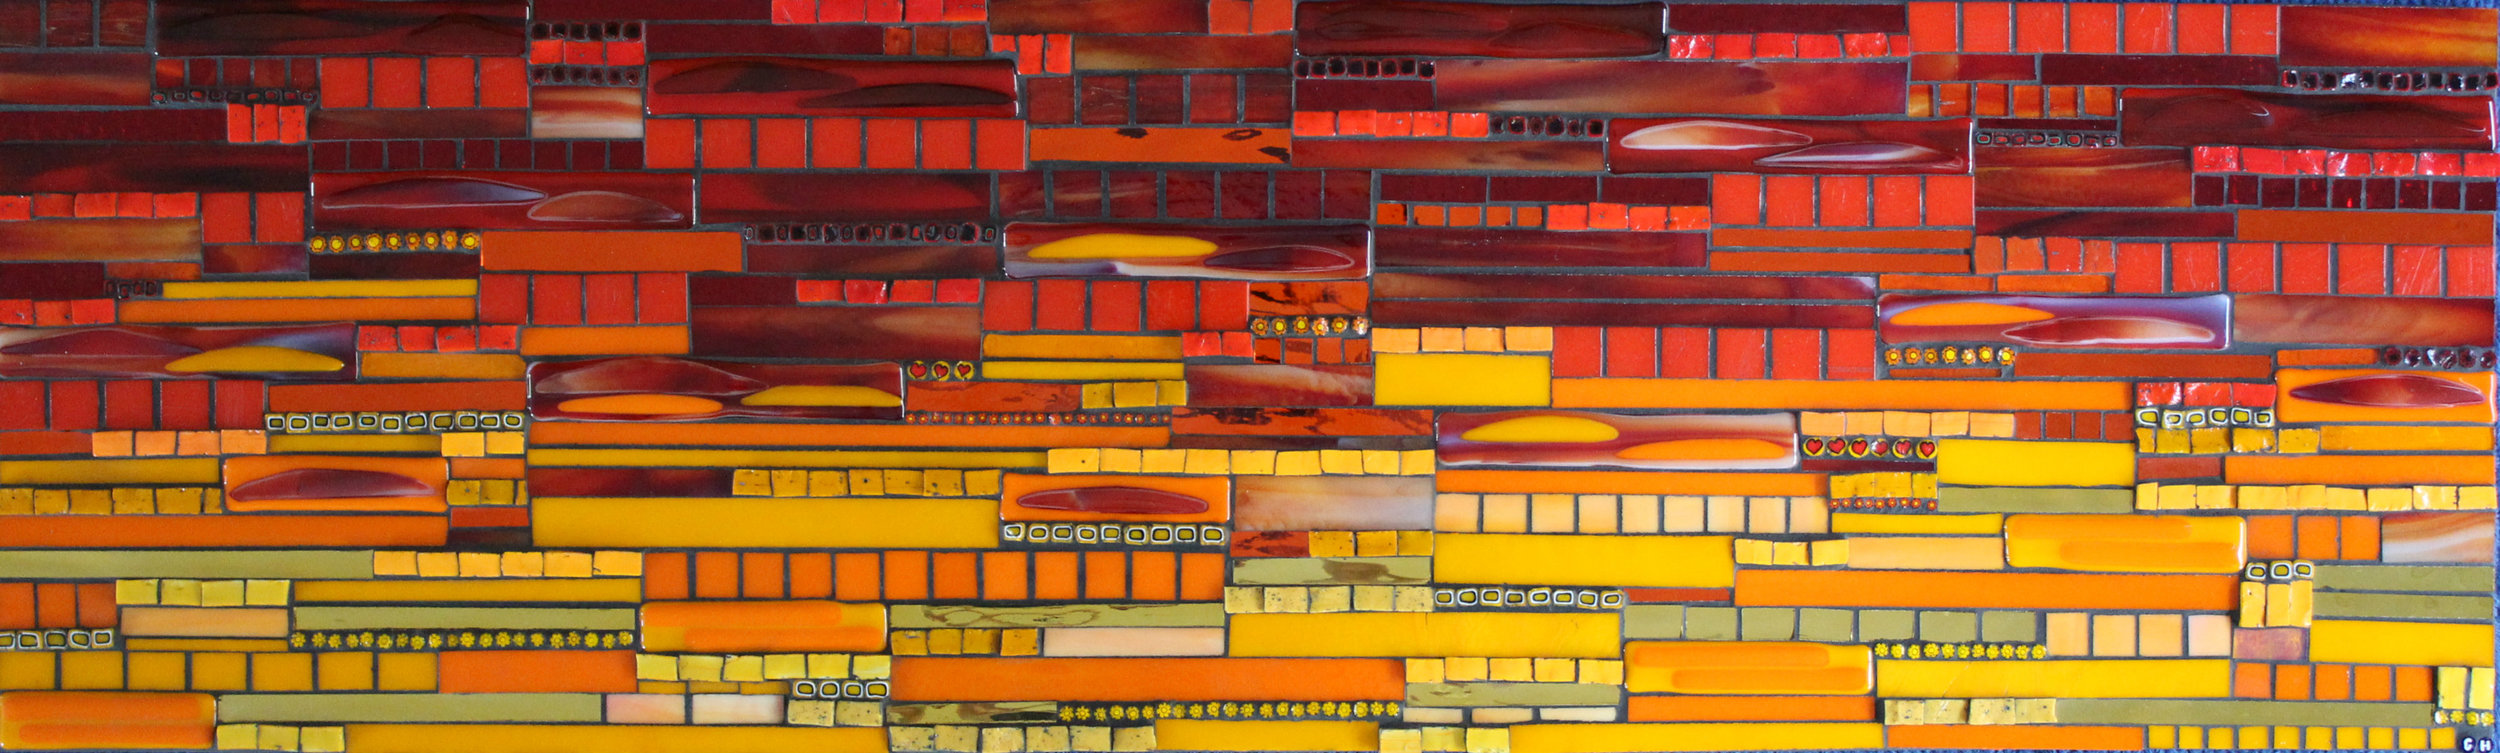 Sunset (Smalti, Millefiori, Glass Fusions, Stained Glass)